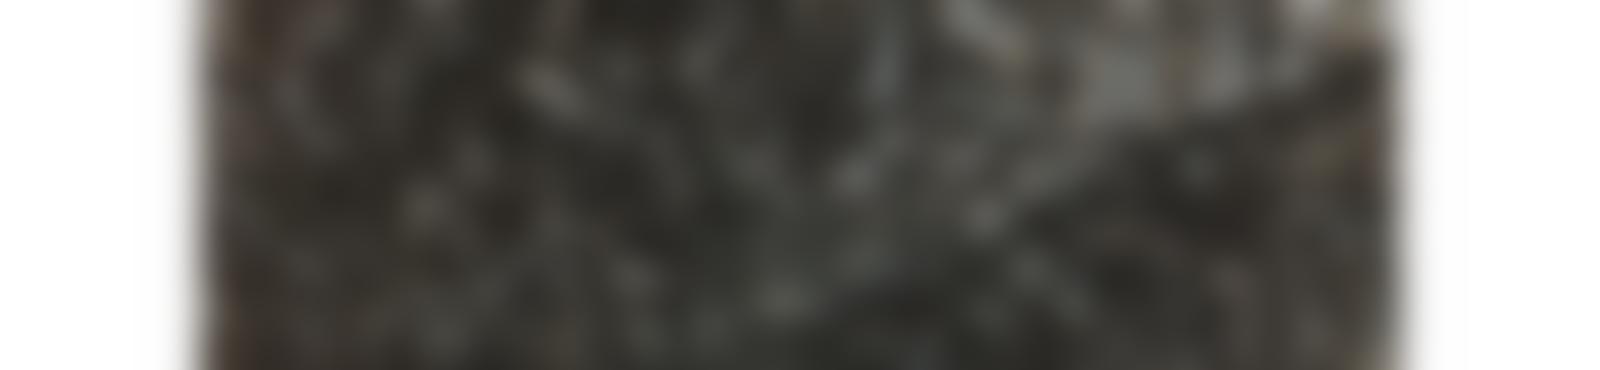 Blurred 0ffaf136 4ec3 47c0 a96a 09dc73f3beb9